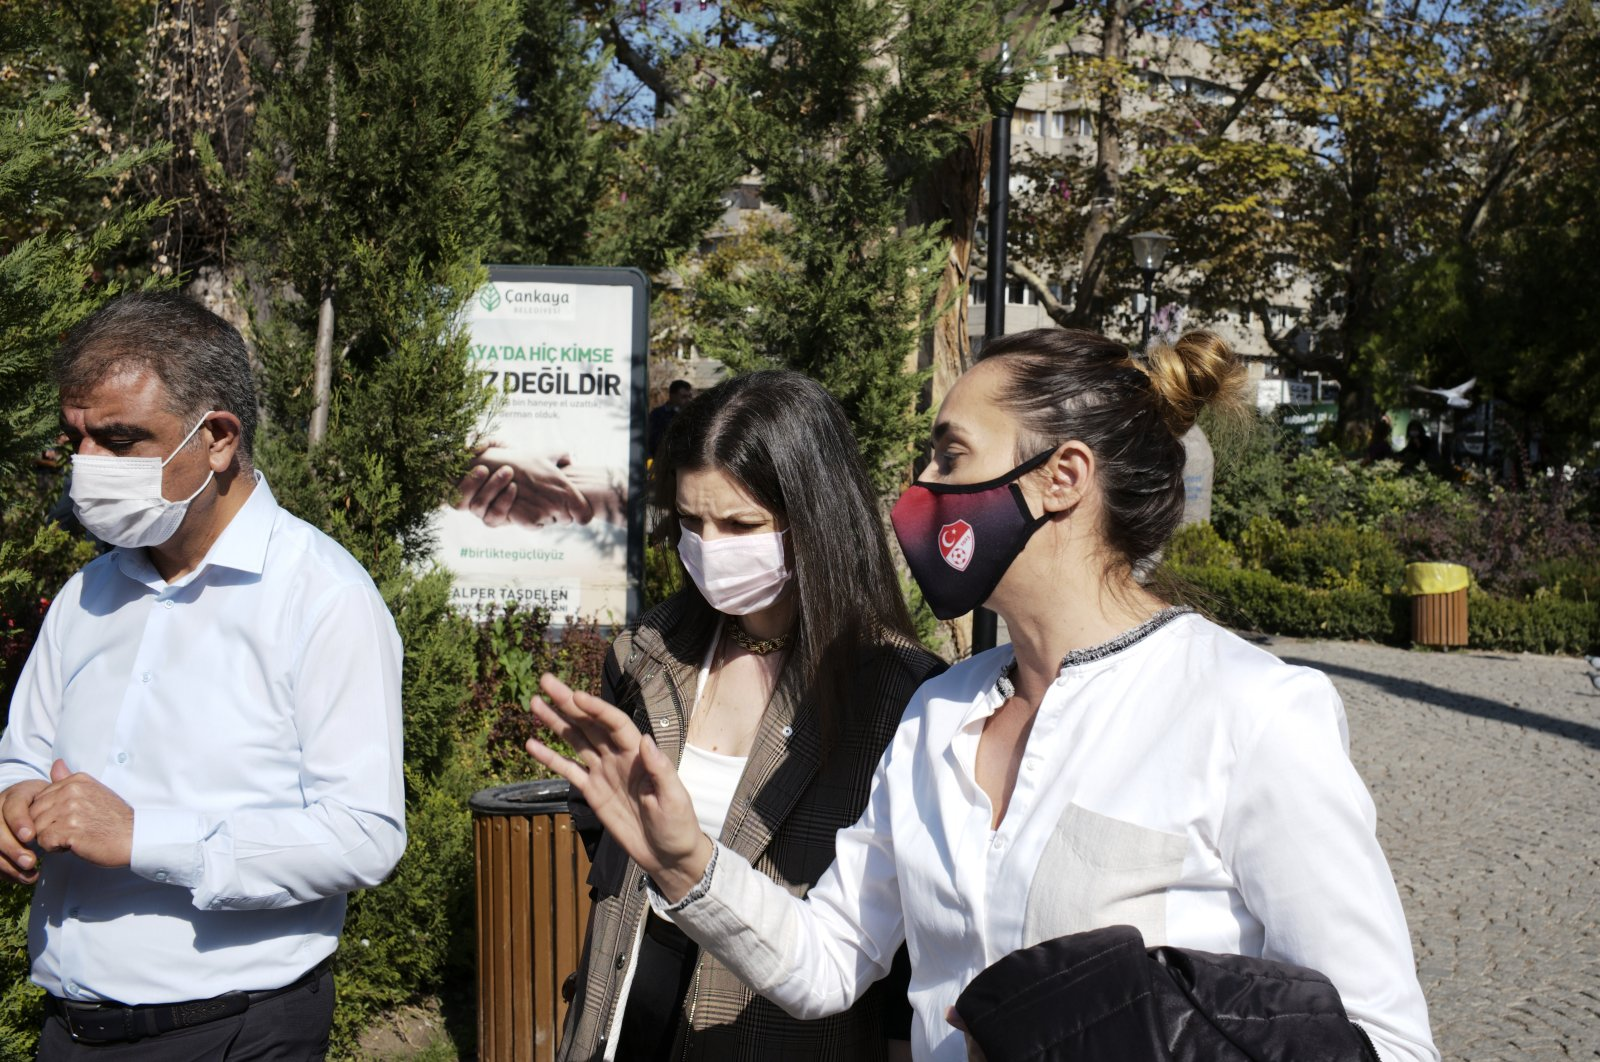 People wearing protective masks walk on a street in the capital Ankara, Turkey, Oct. 23, 2020. (AP Photo)